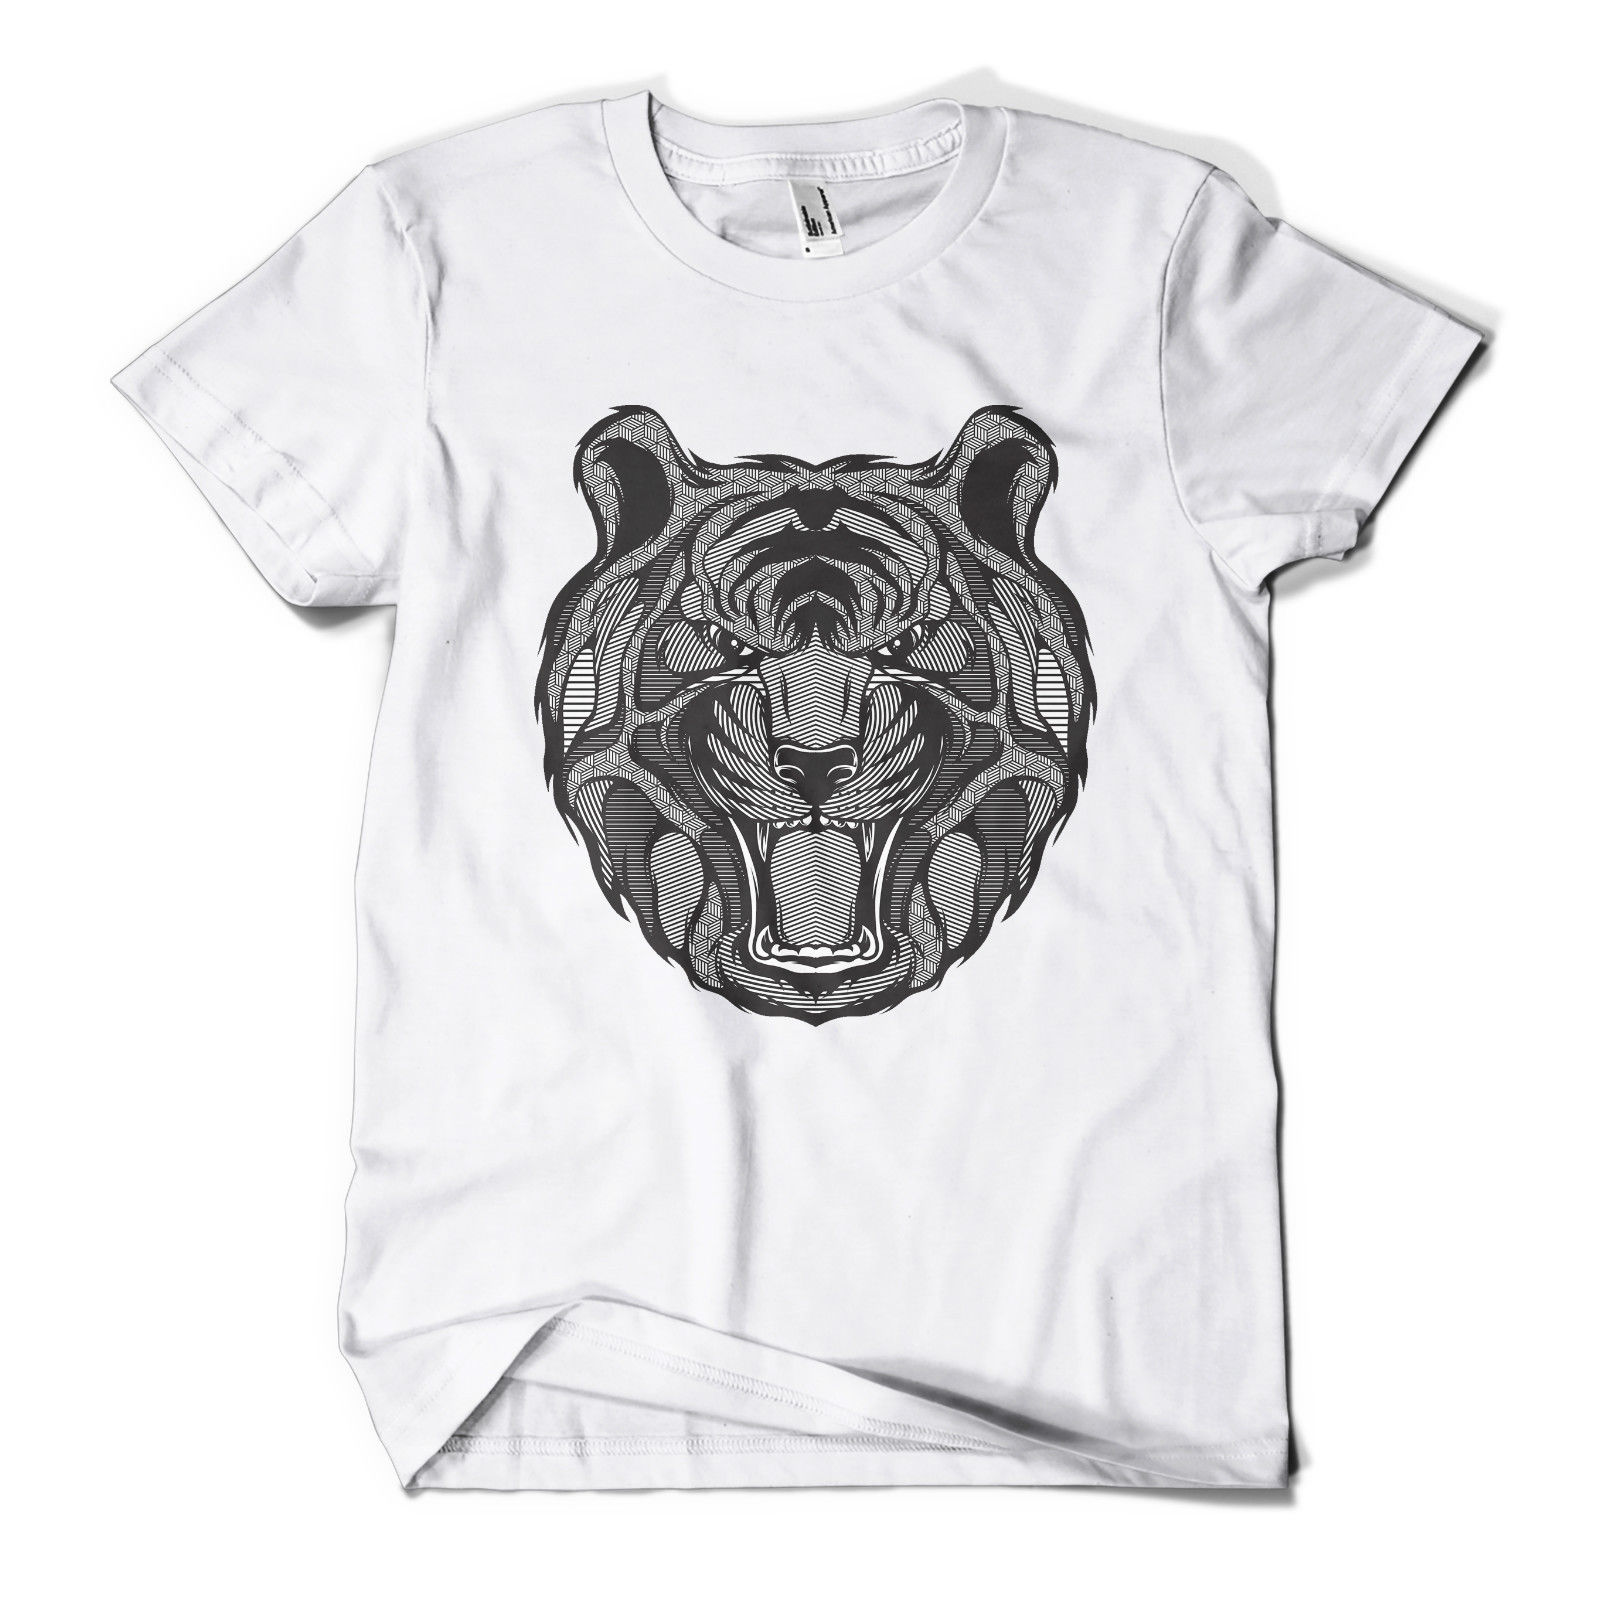 Design t shirt china - Graphic Tiger Printed T Shirt Hipster Design Urban Fashion Mens Girls Tee Top Hot New